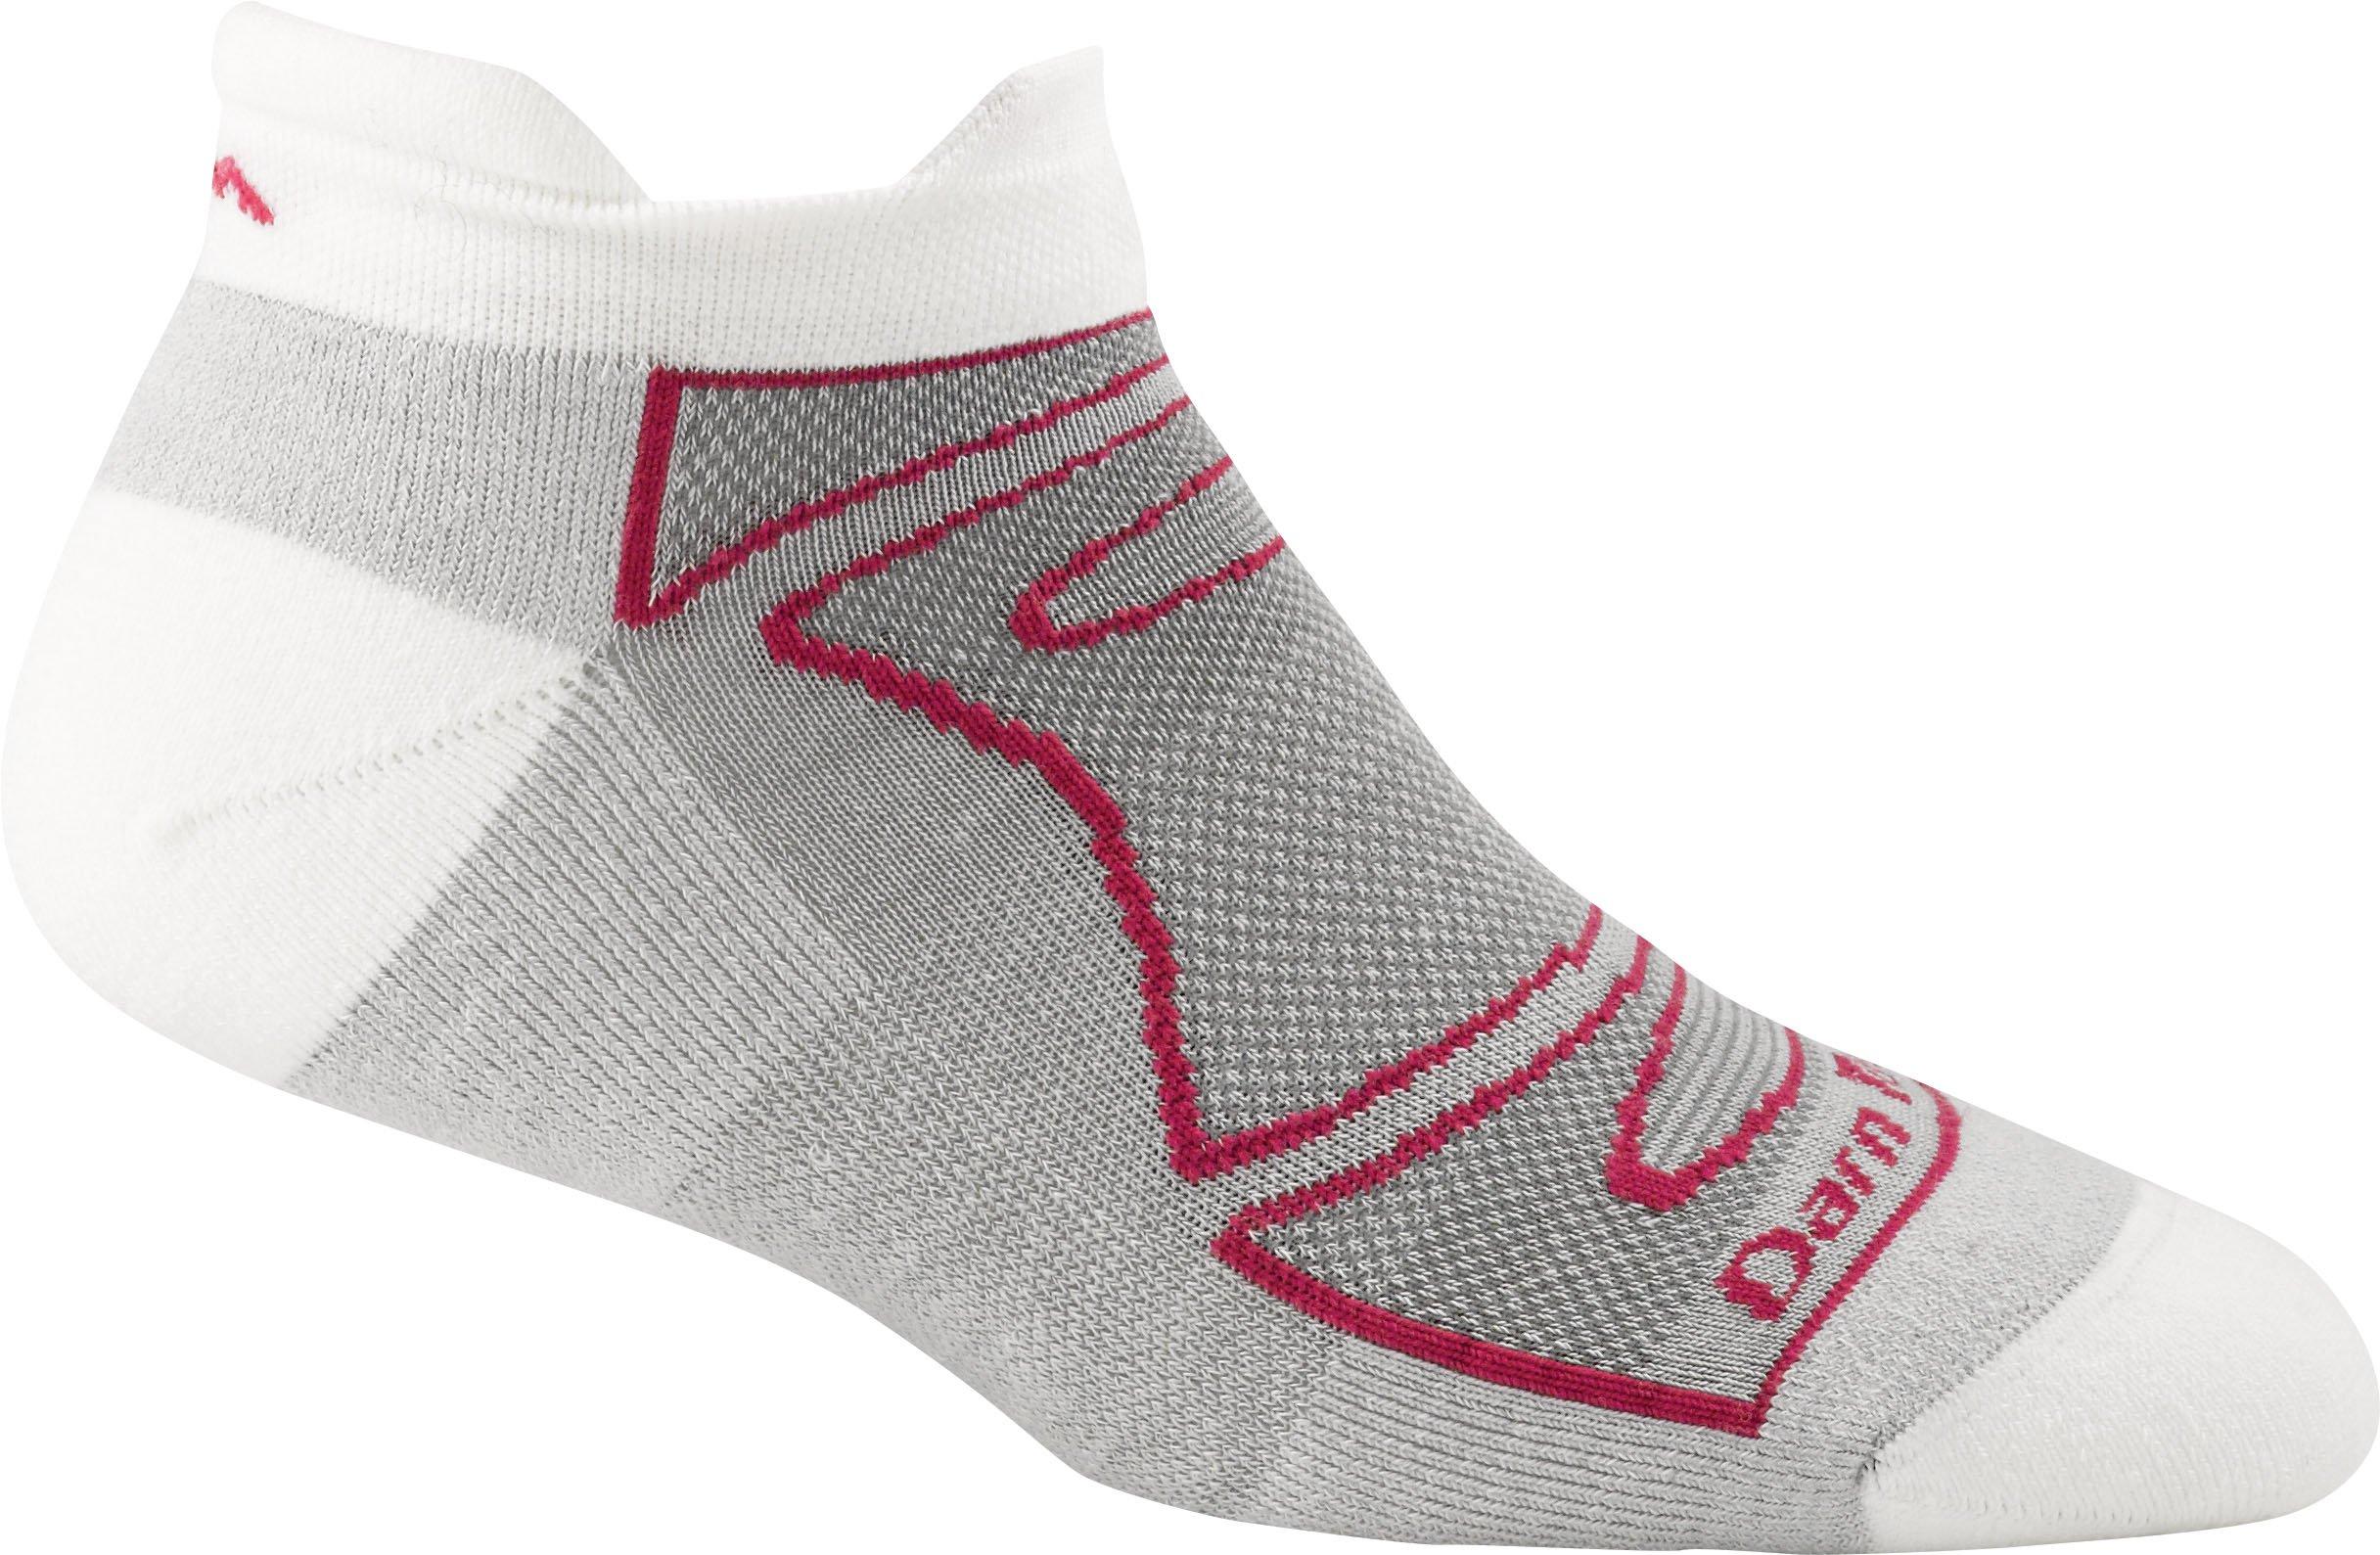 Darn Tough Vermont Women's Merino Wool No-Show Ultra-Light Cushion Athletic Socks